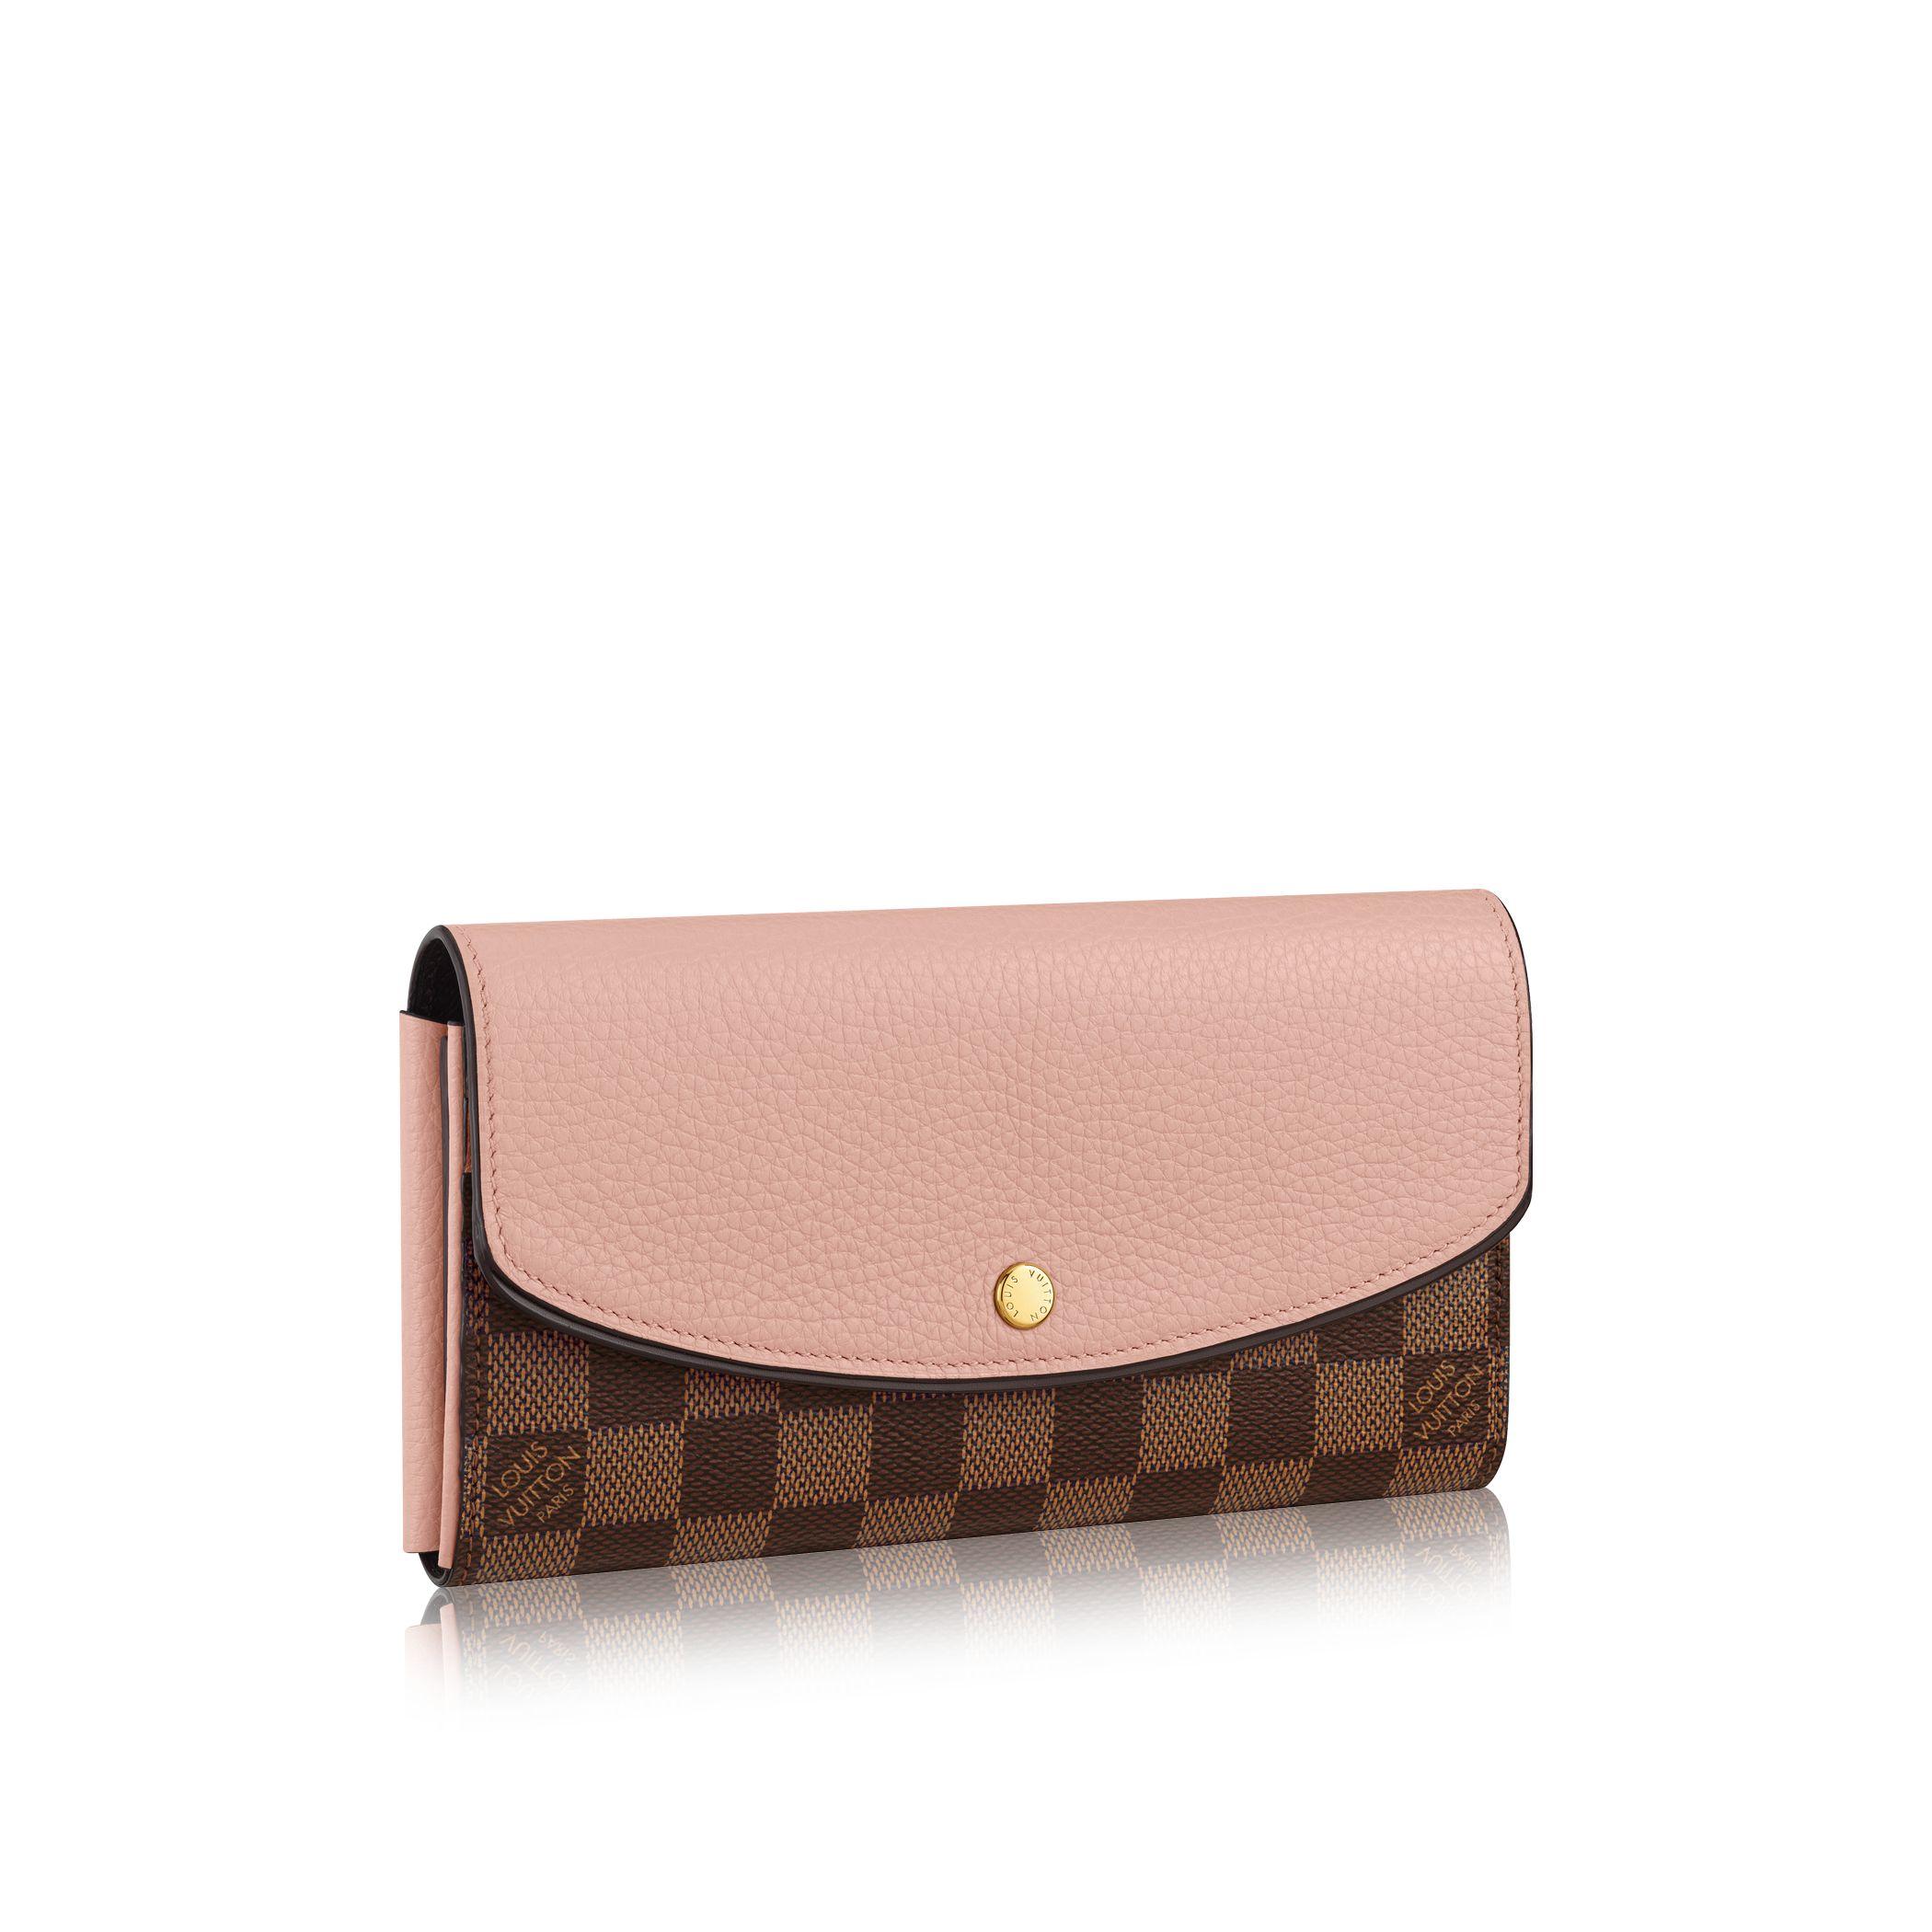 louis vuitton normandy wallet in brown lyst